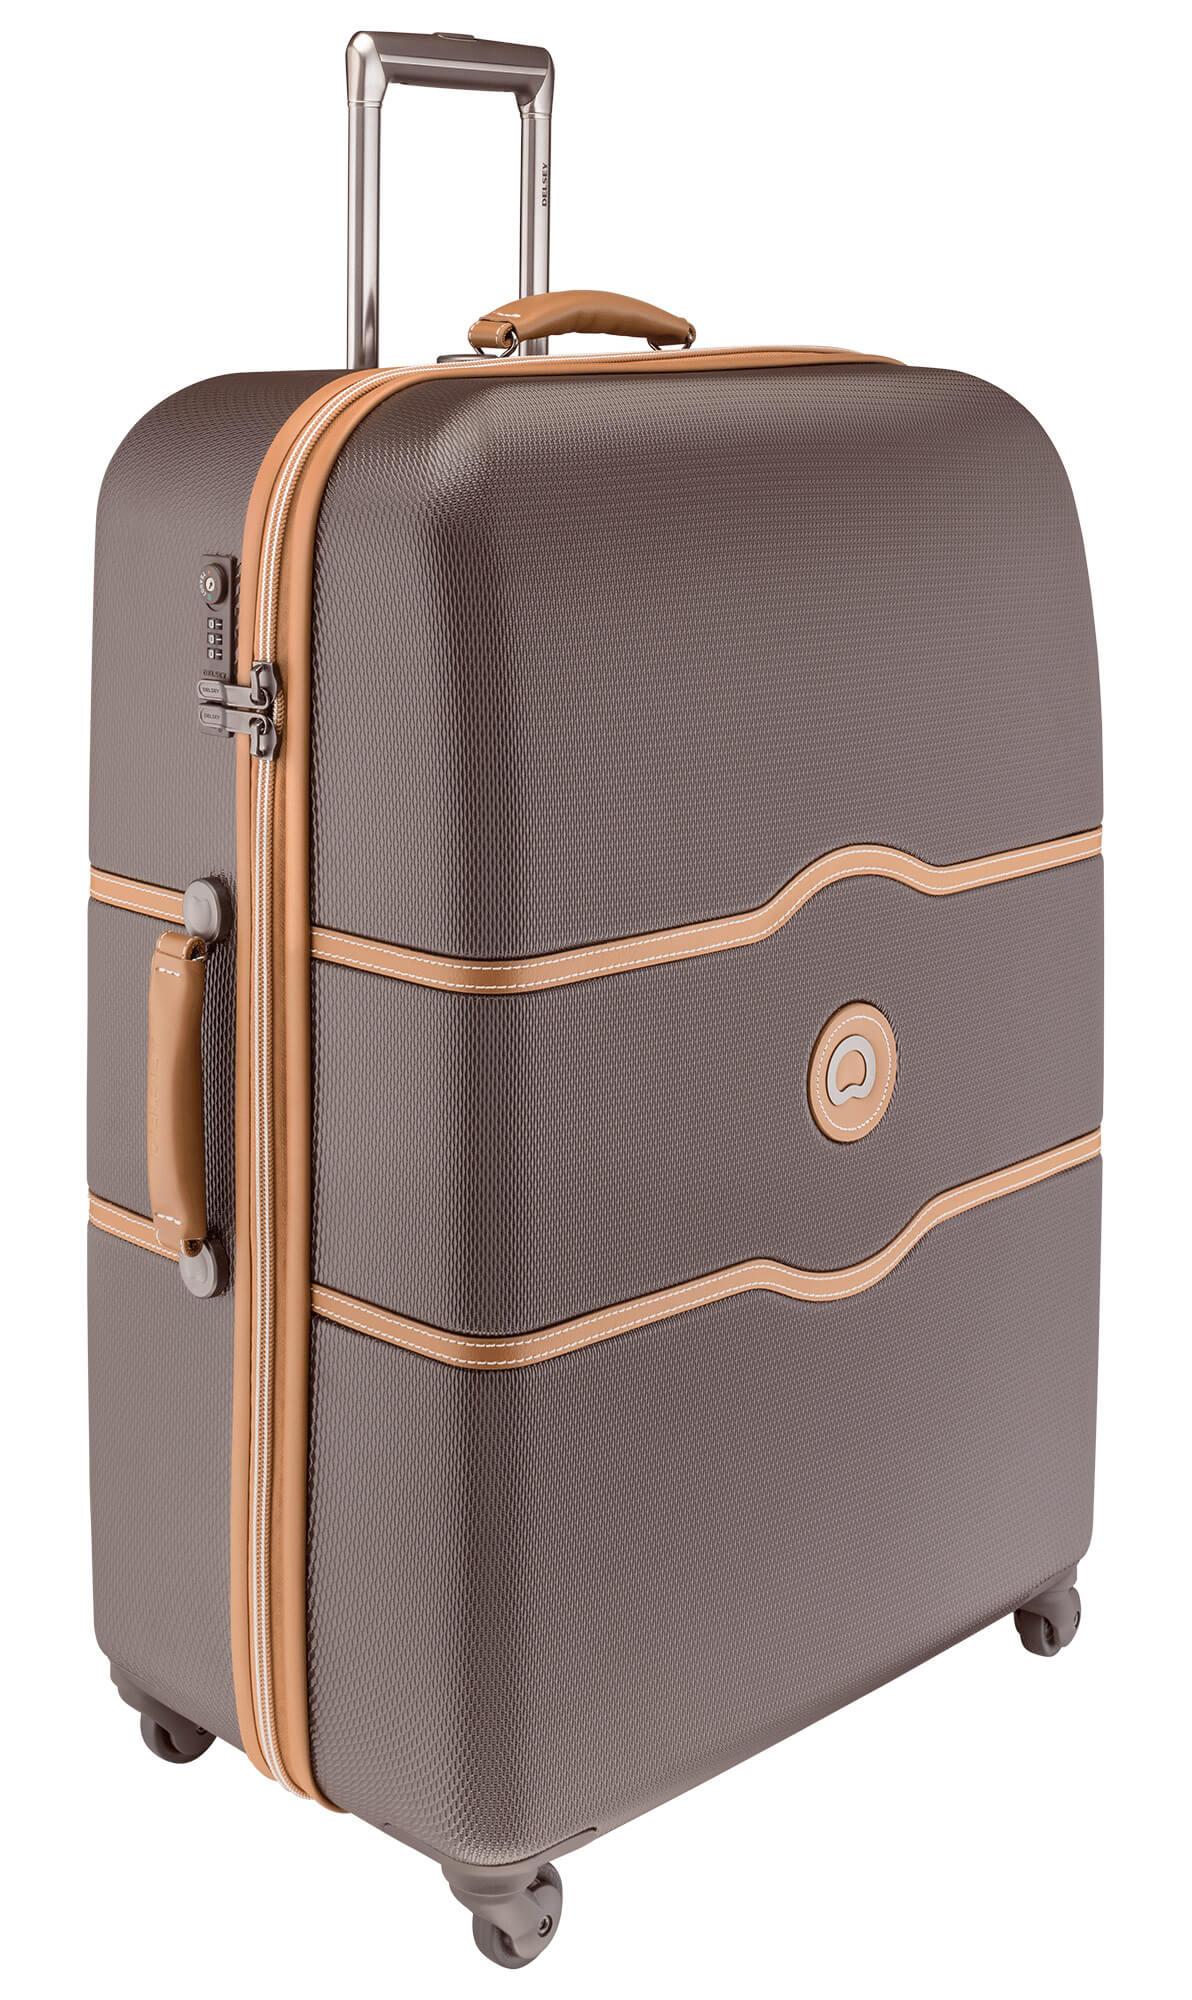 bagage pas cher bagage pas cher valise rigide grande taille david jones ba20581g palmier. Black Bedroom Furniture Sets. Home Design Ideas